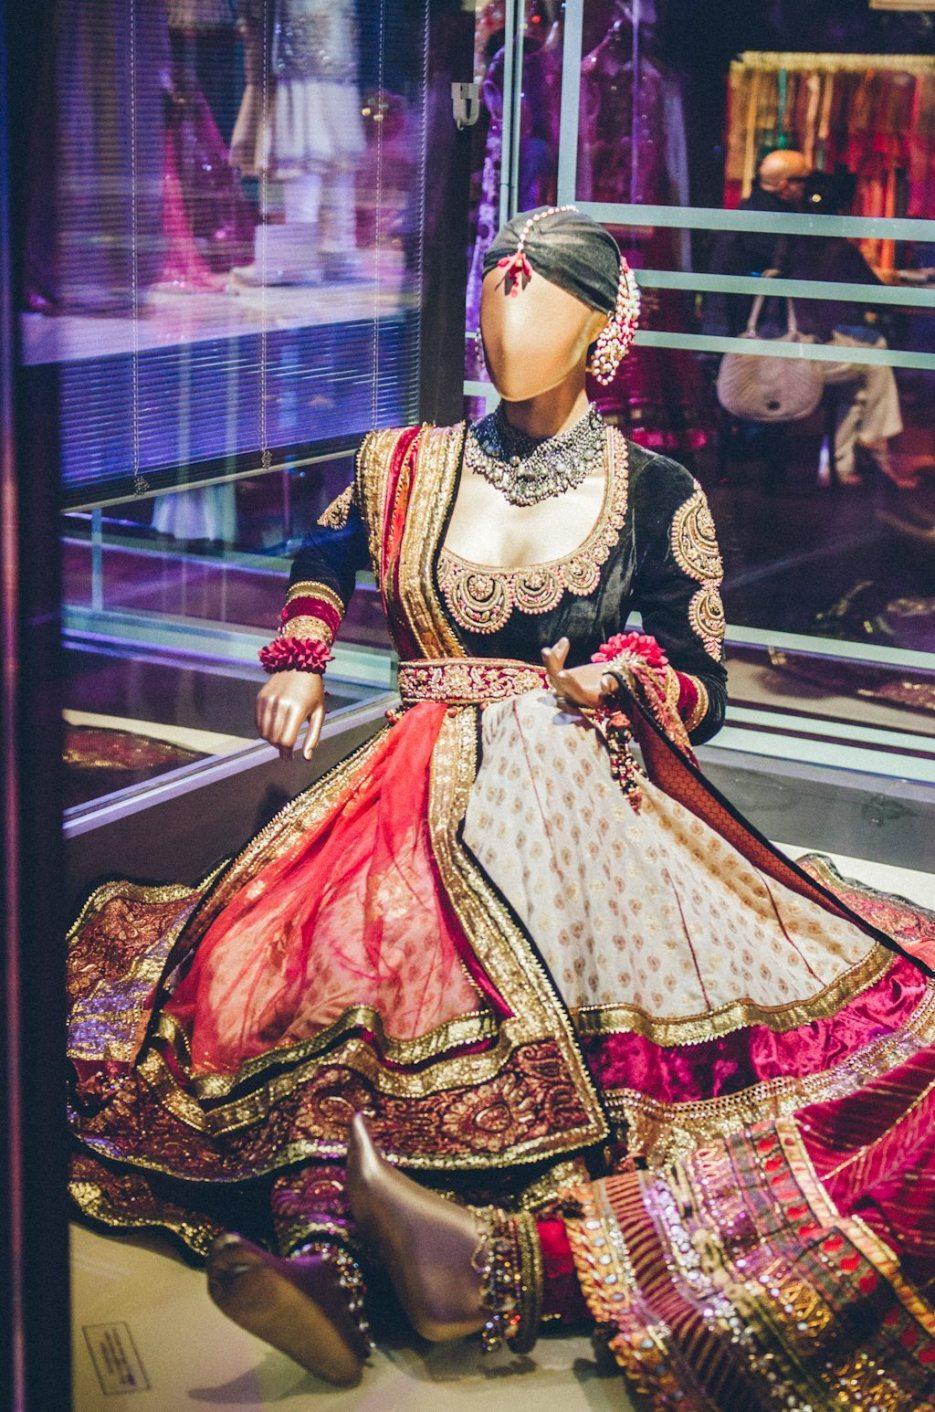 Tarun-Tahiliani-Bridal-Couture-Wedding-Wear-Fashion-Designer-Photographer-Naina-Knottytales-36.jpg